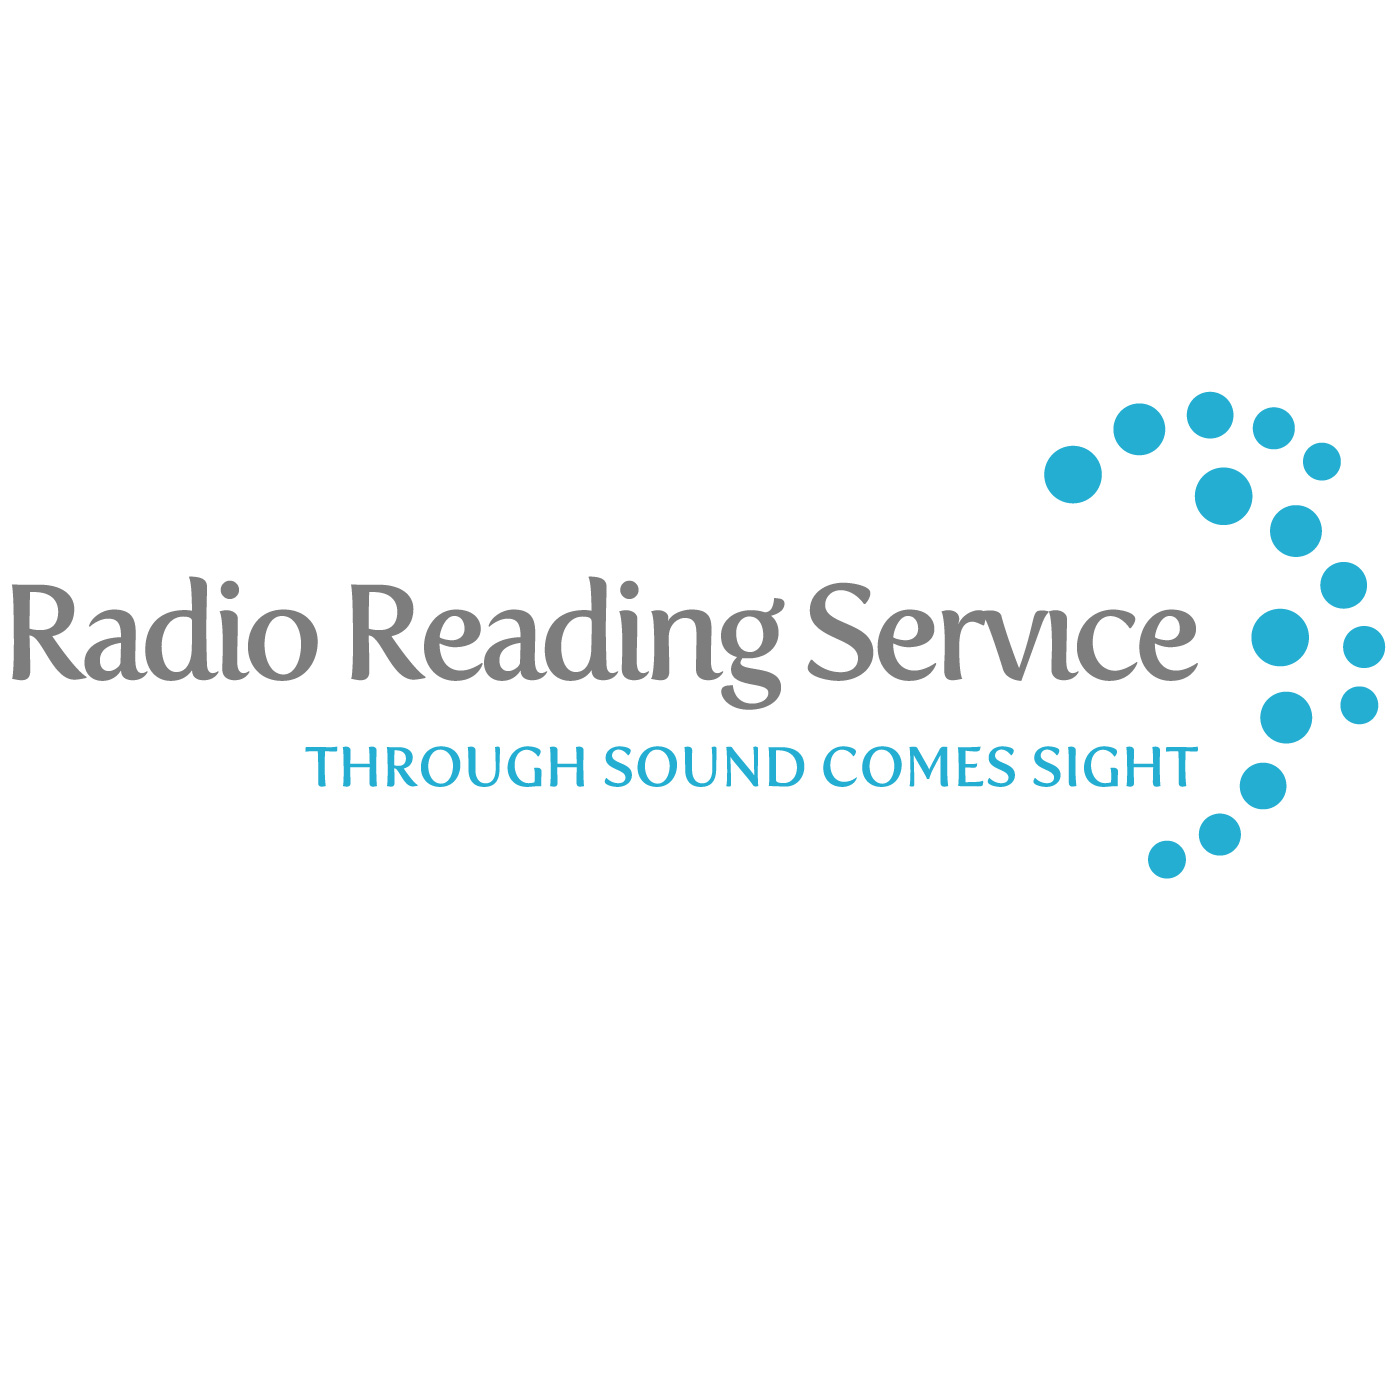 Radio Reading Service